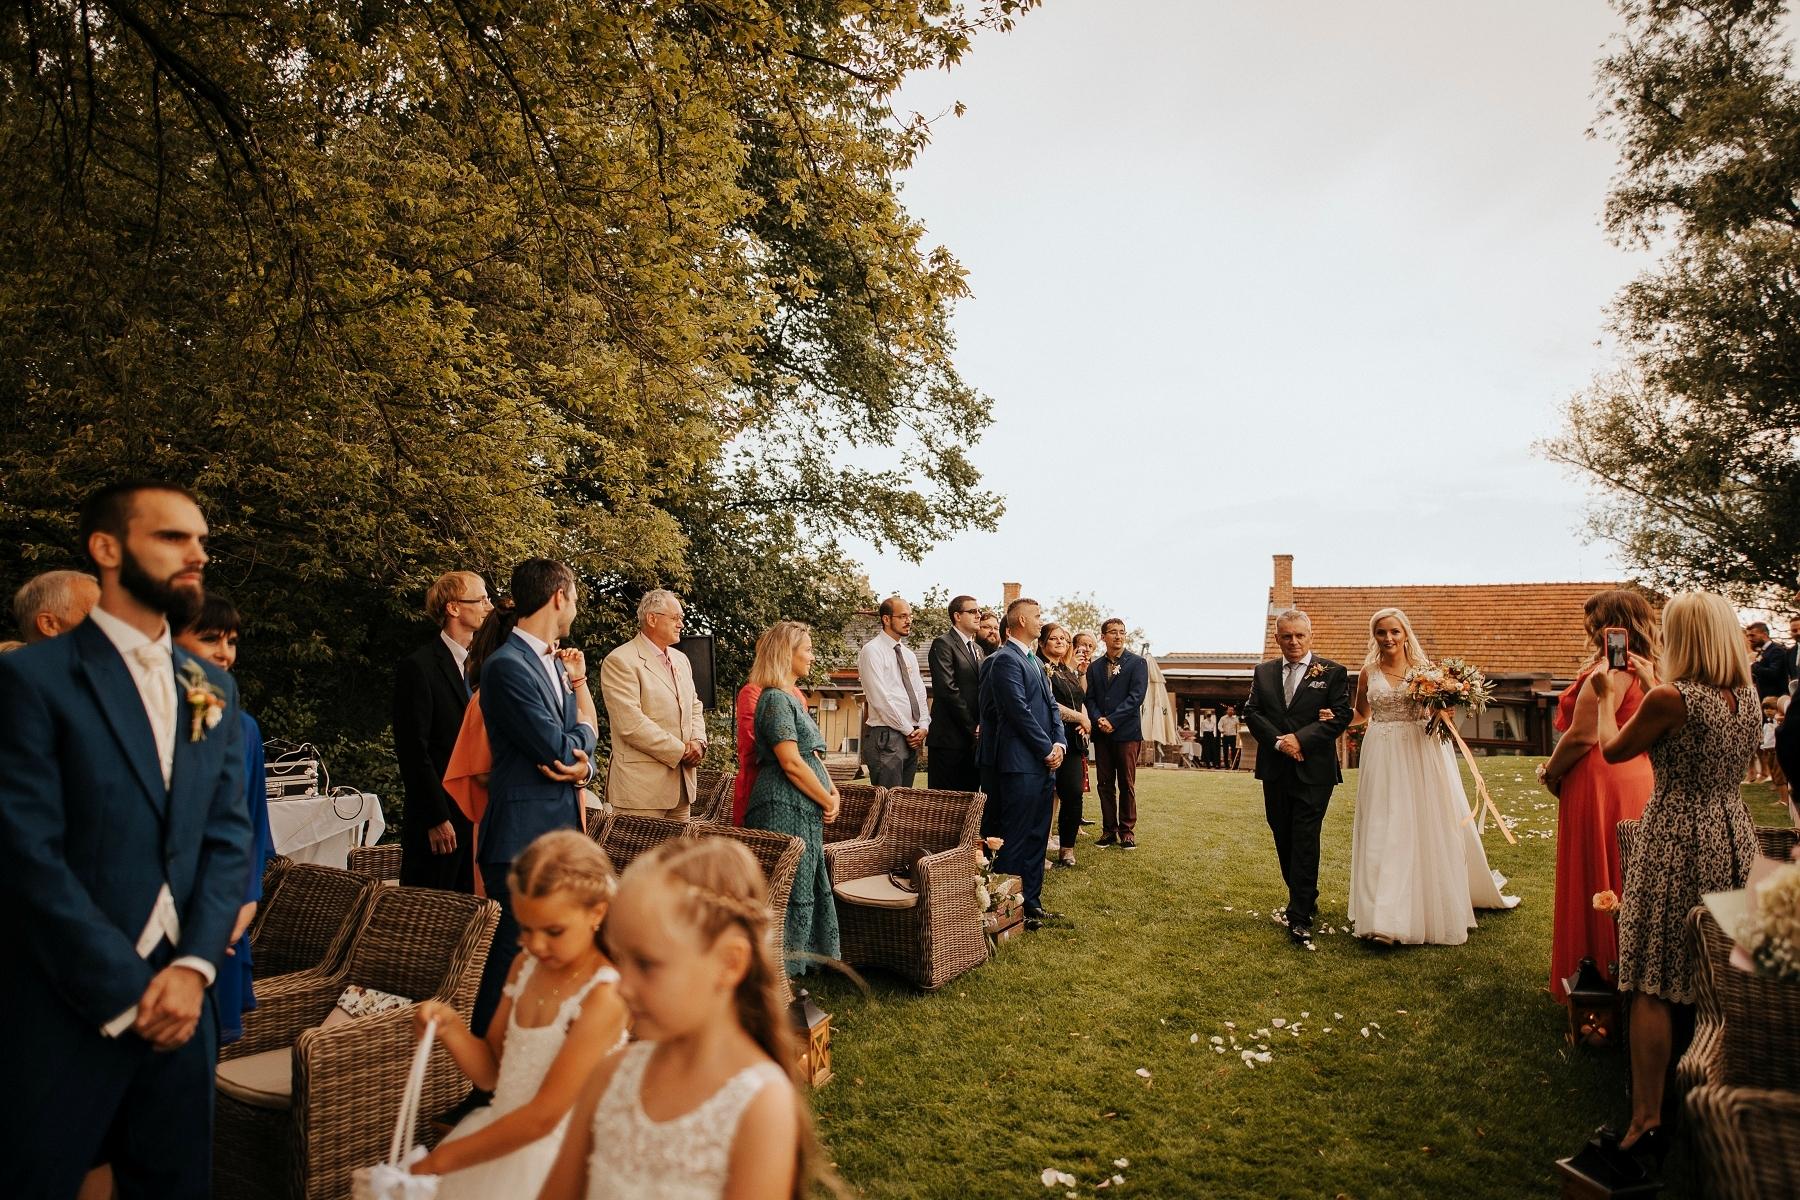 Lubos Krahulec, svadobny fotograf, fotograf vychod, slovensko, slovakia, czech, europan, presov, wedding, natural wedding portrait, best wedding photo, asociacia slovenskych svadobnych fotografov, cech fotografov, fotograf krahulec,